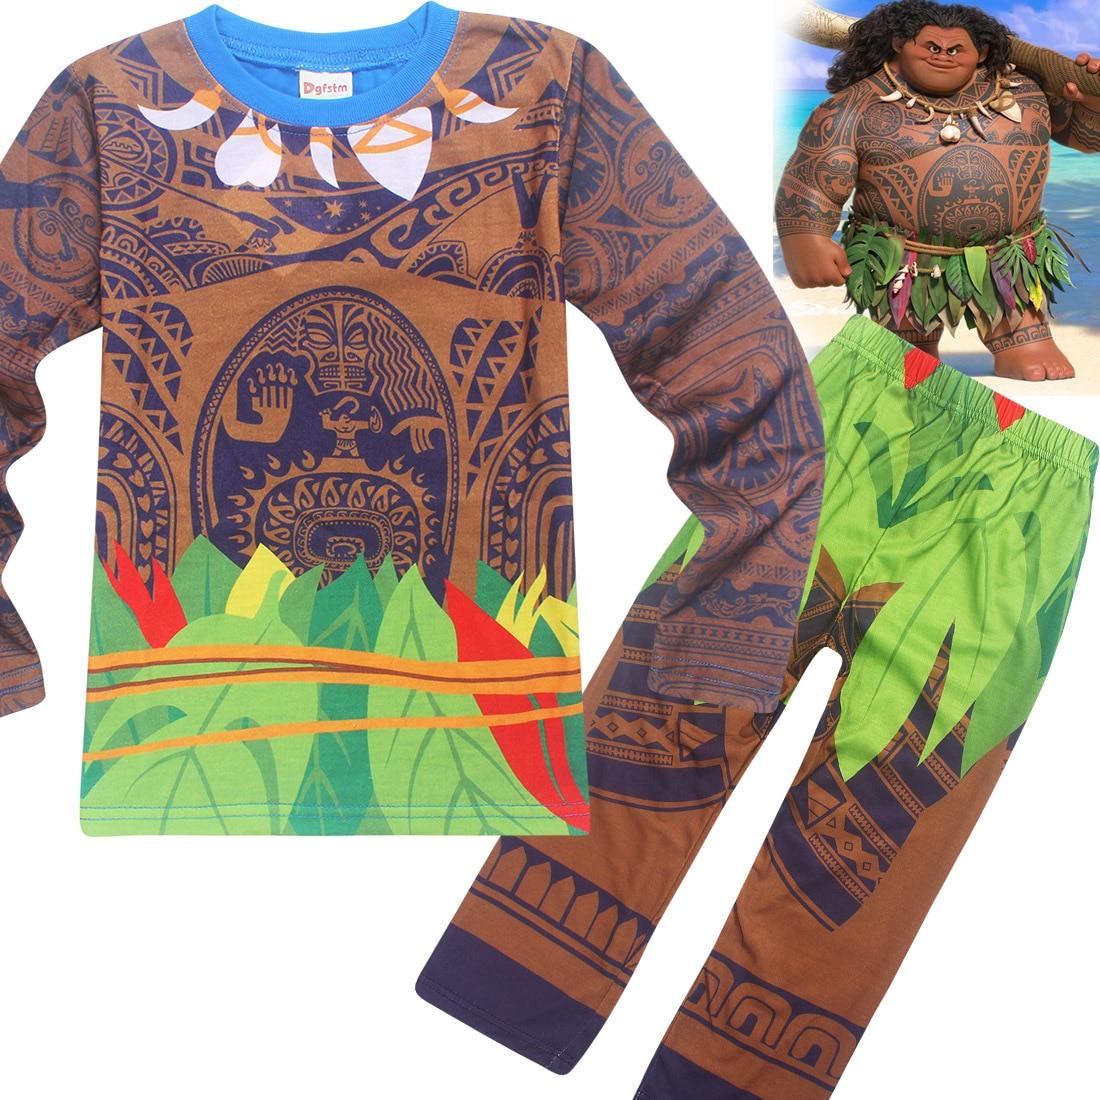 Maui Boys Sleepwear Moana vaiana Costume Ladies Pajama Christmas Pyjama Youngsters pokemon nijia Lengthy Sleeve T-shirt+Print Clothes Set Clothes Units, Low cost Clothes Units, Maui Boys Sleepwear Moana vaiana...